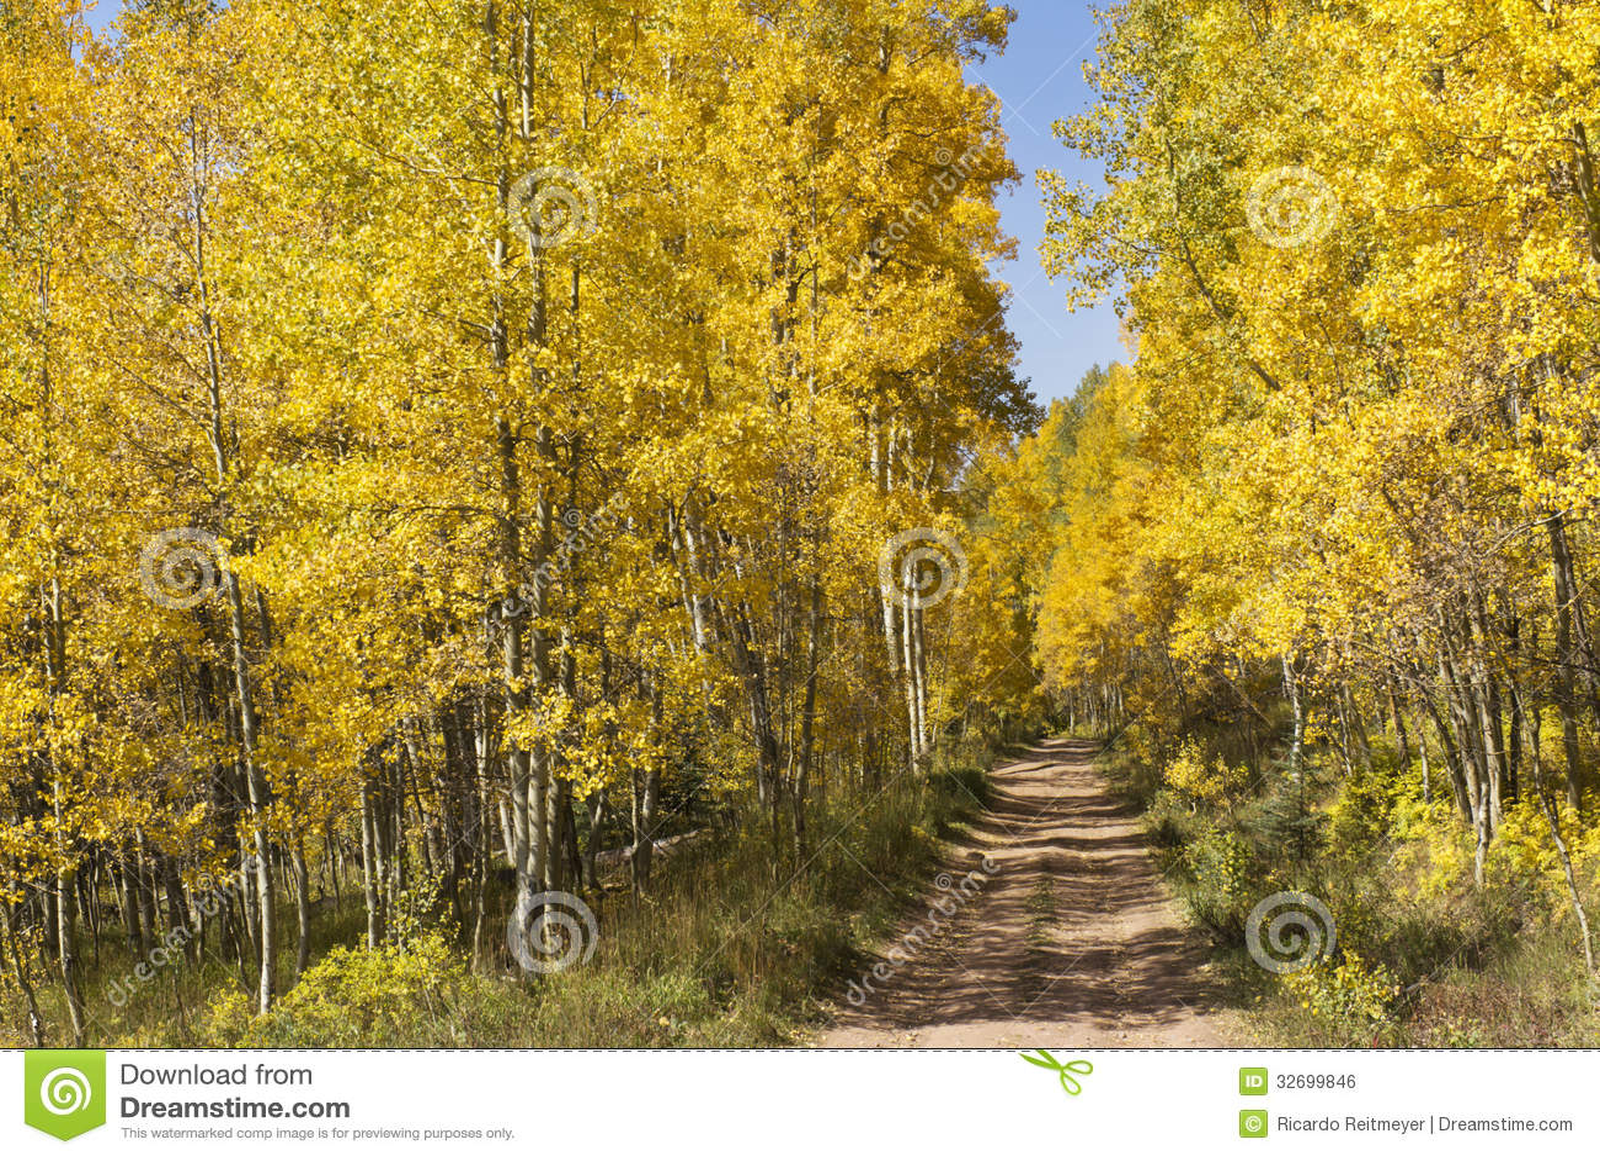 Download Beautiful Golden Aspen Lined Mountain Road Near Va Stock Photo - Image of mountains, golden: 32699846